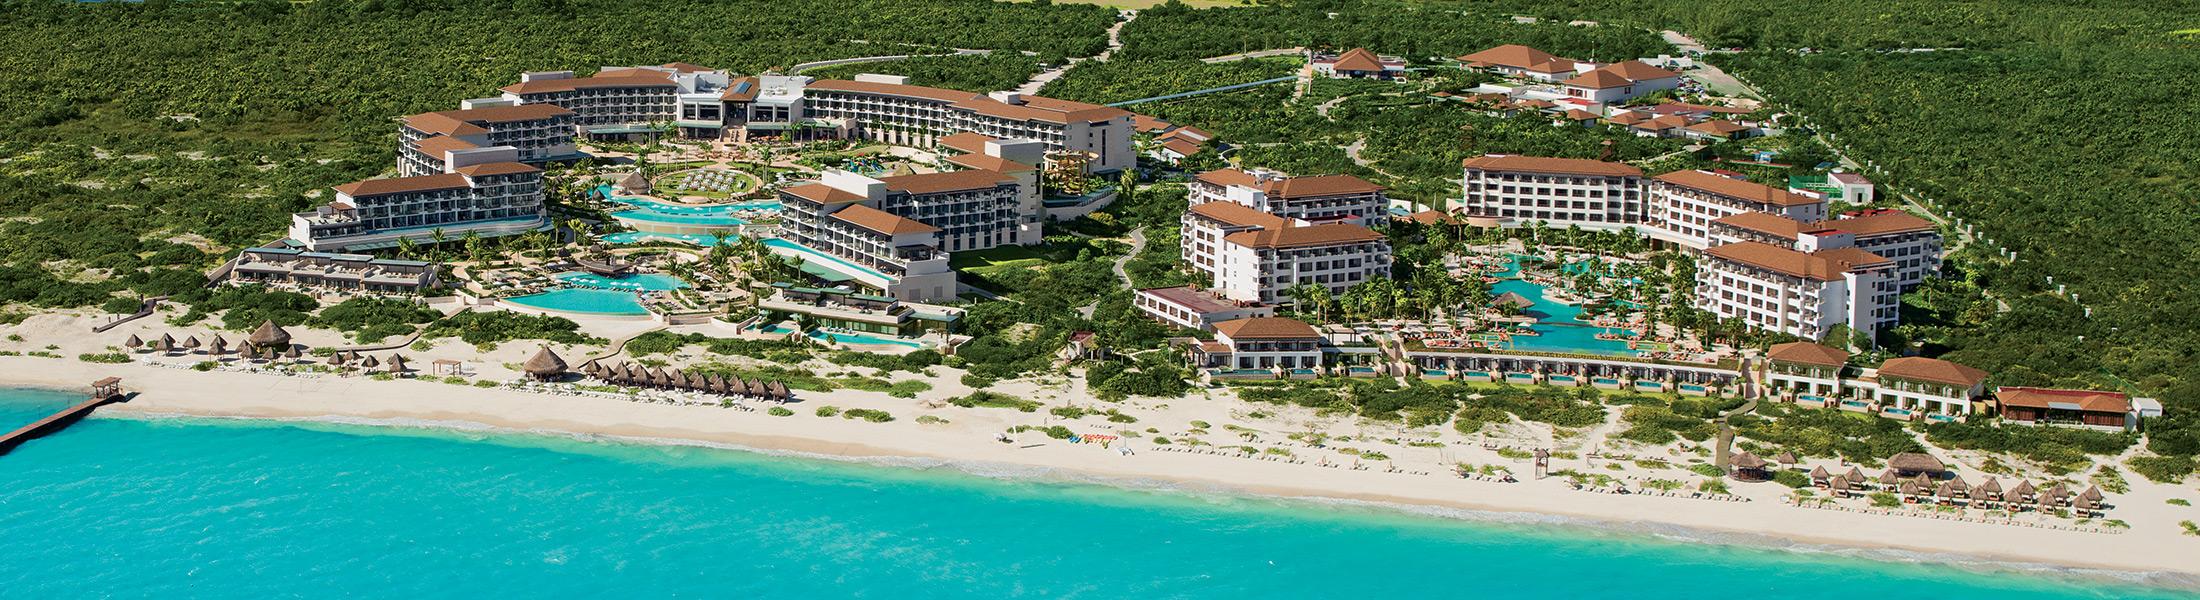 Aerial view of Dreams Playa Mujeres